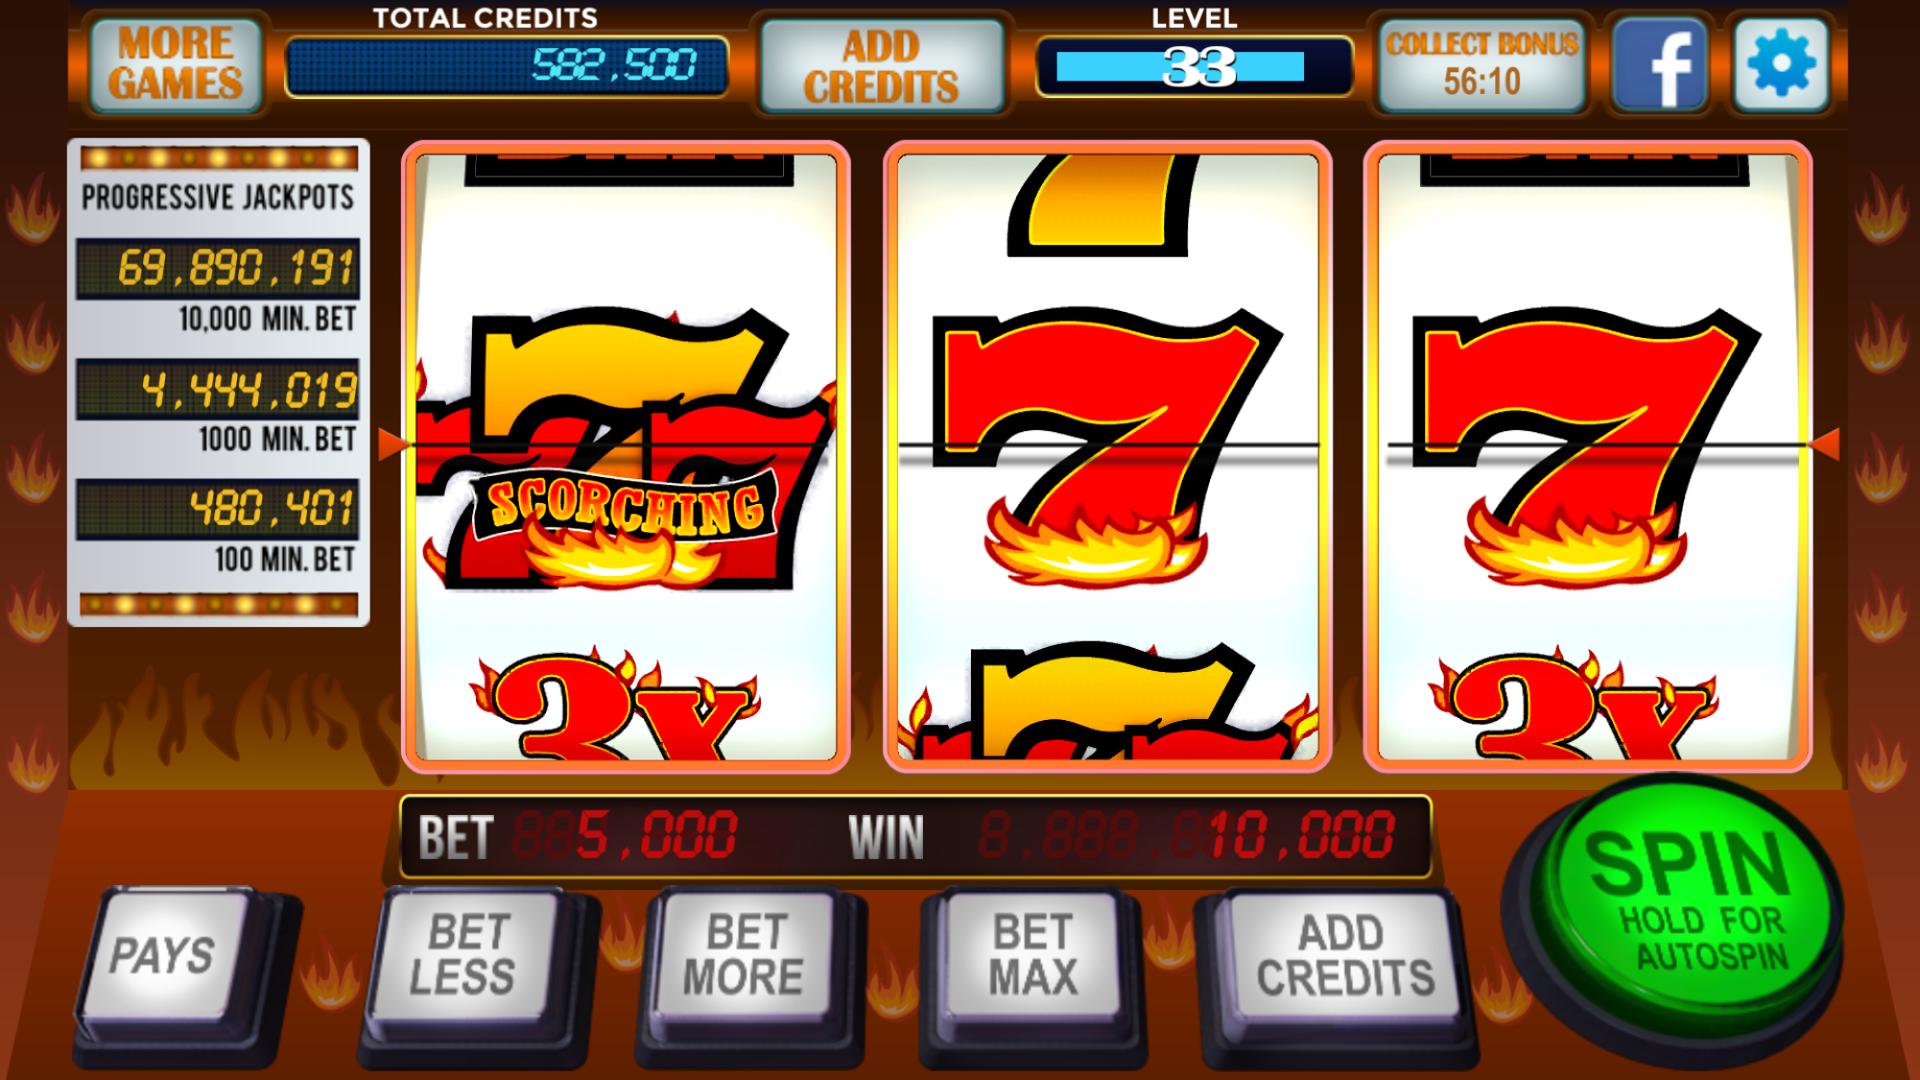 All Slots casino titanpoker com gratis - 59907